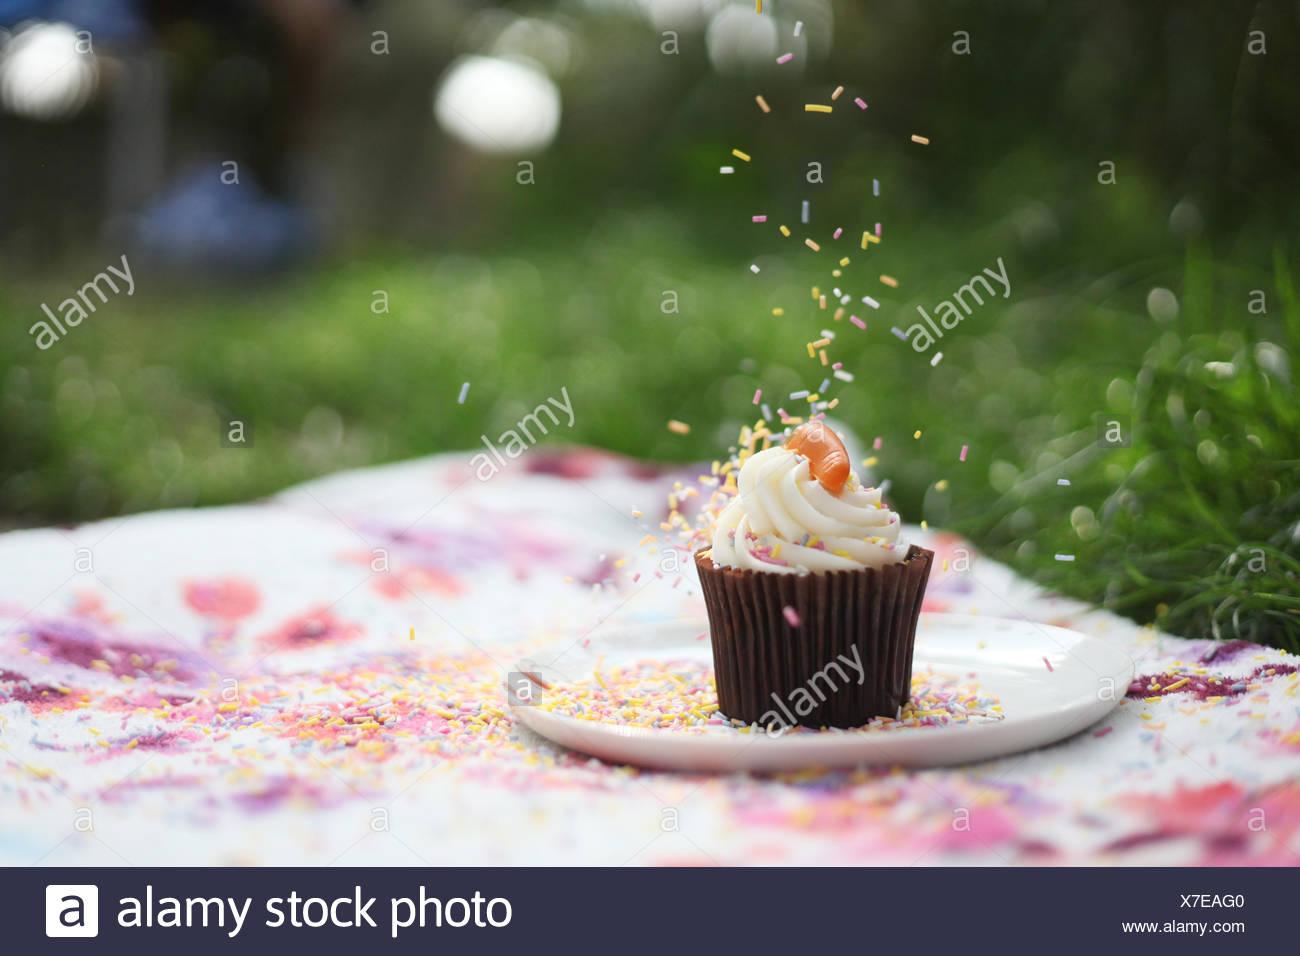 Prise Streusel auf Cupcake bei Picknick Stockbild